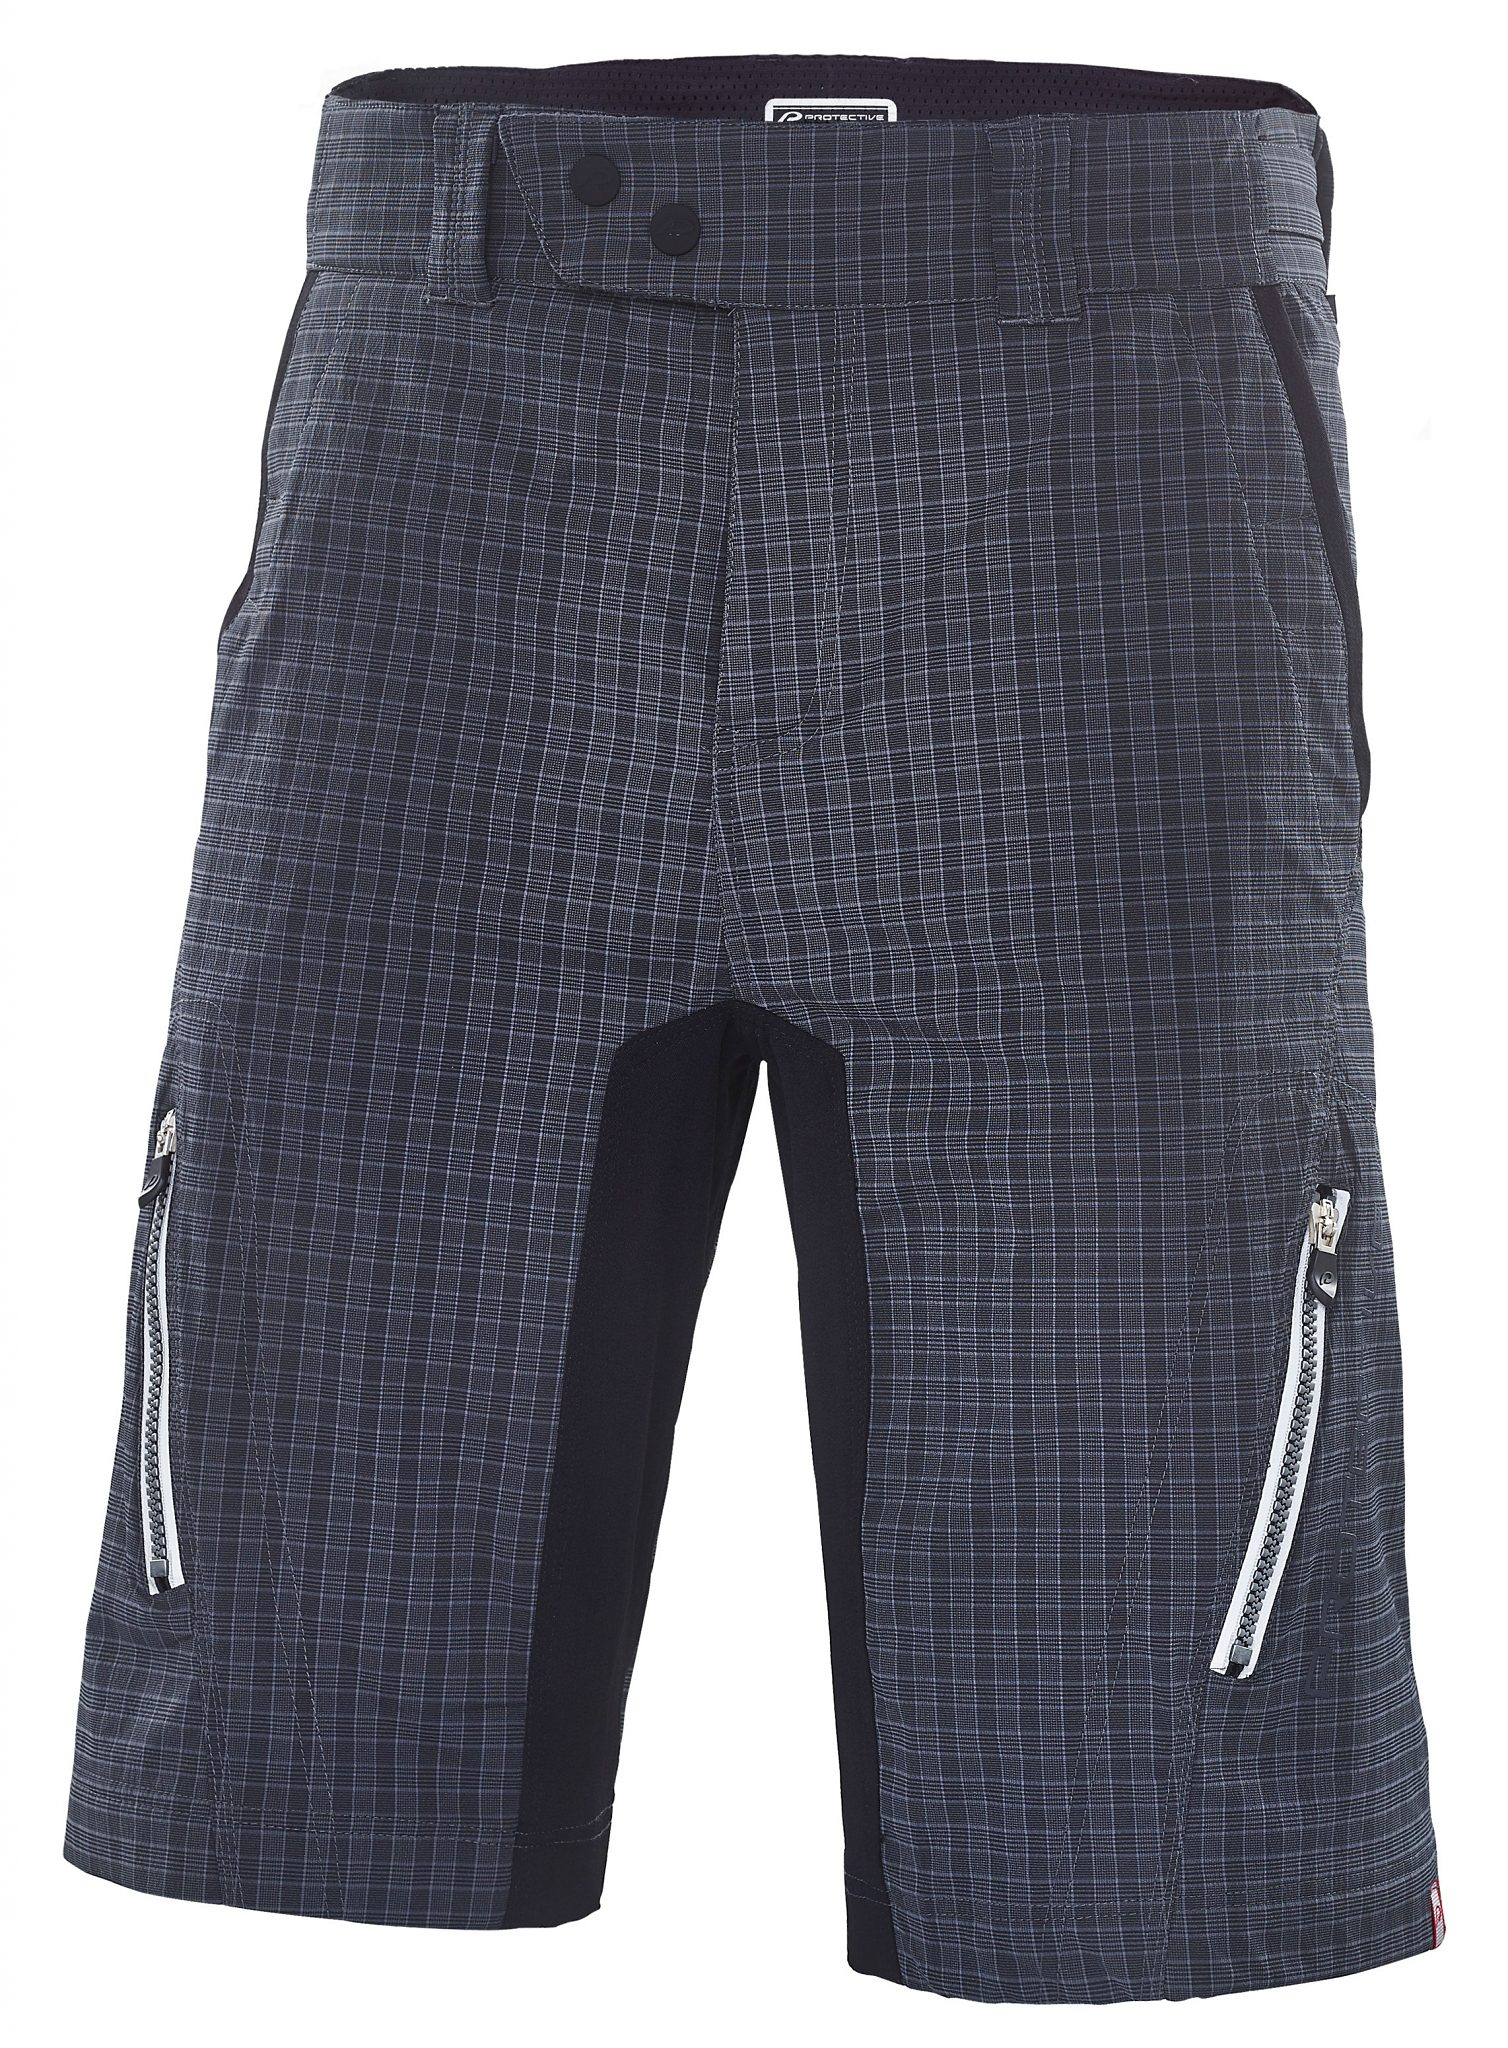 Protective Radhose »Lecton Shorts Men«